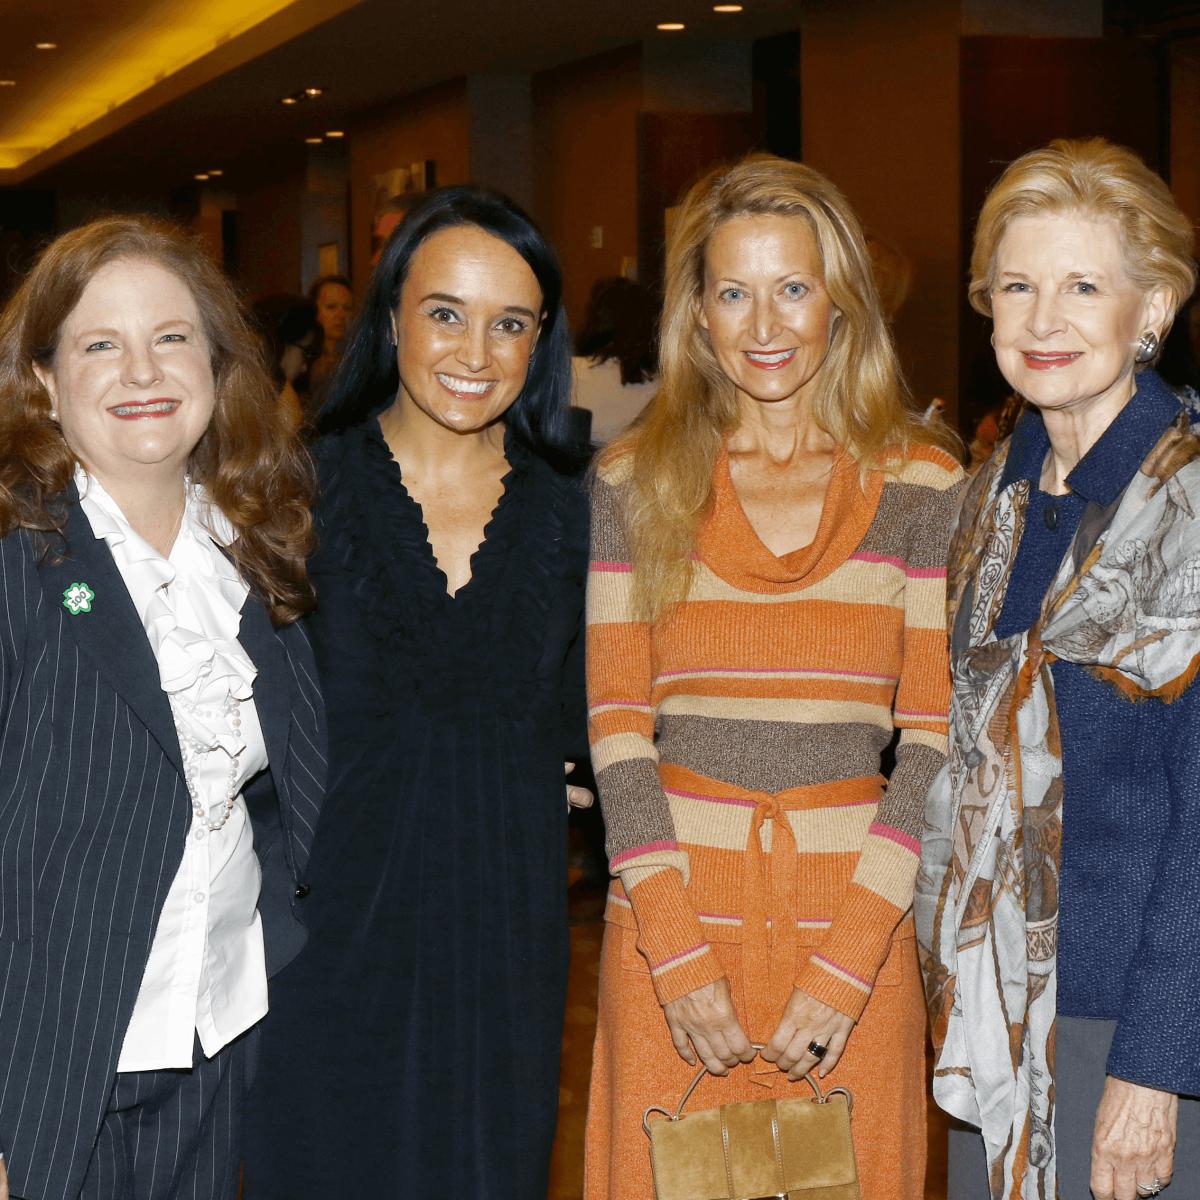 Paige McDaniel, Jonna Clarke, Lynn McBee, Karen Prothro - Community Partners